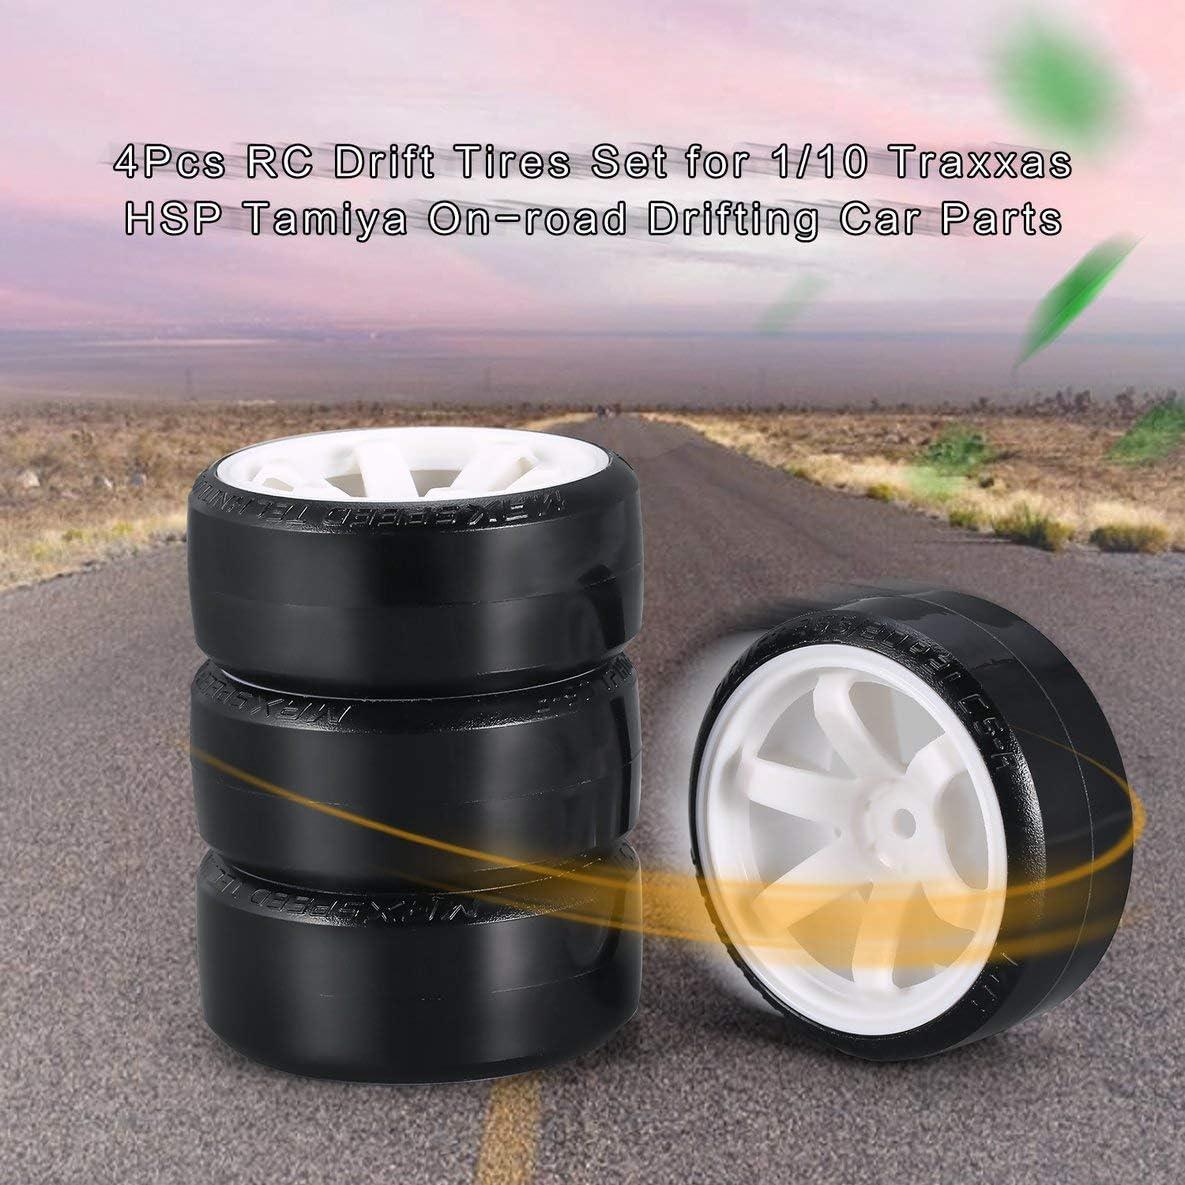 grau nbvmngjhjlkjlUK 4-teiliges RC-Drift-Hartplastik-Hartreifenset f/ür Traxxas HSP Tamiya HPI RC-Ersatzfahrzeuge f/ür Stra/ßenfahrzeuge